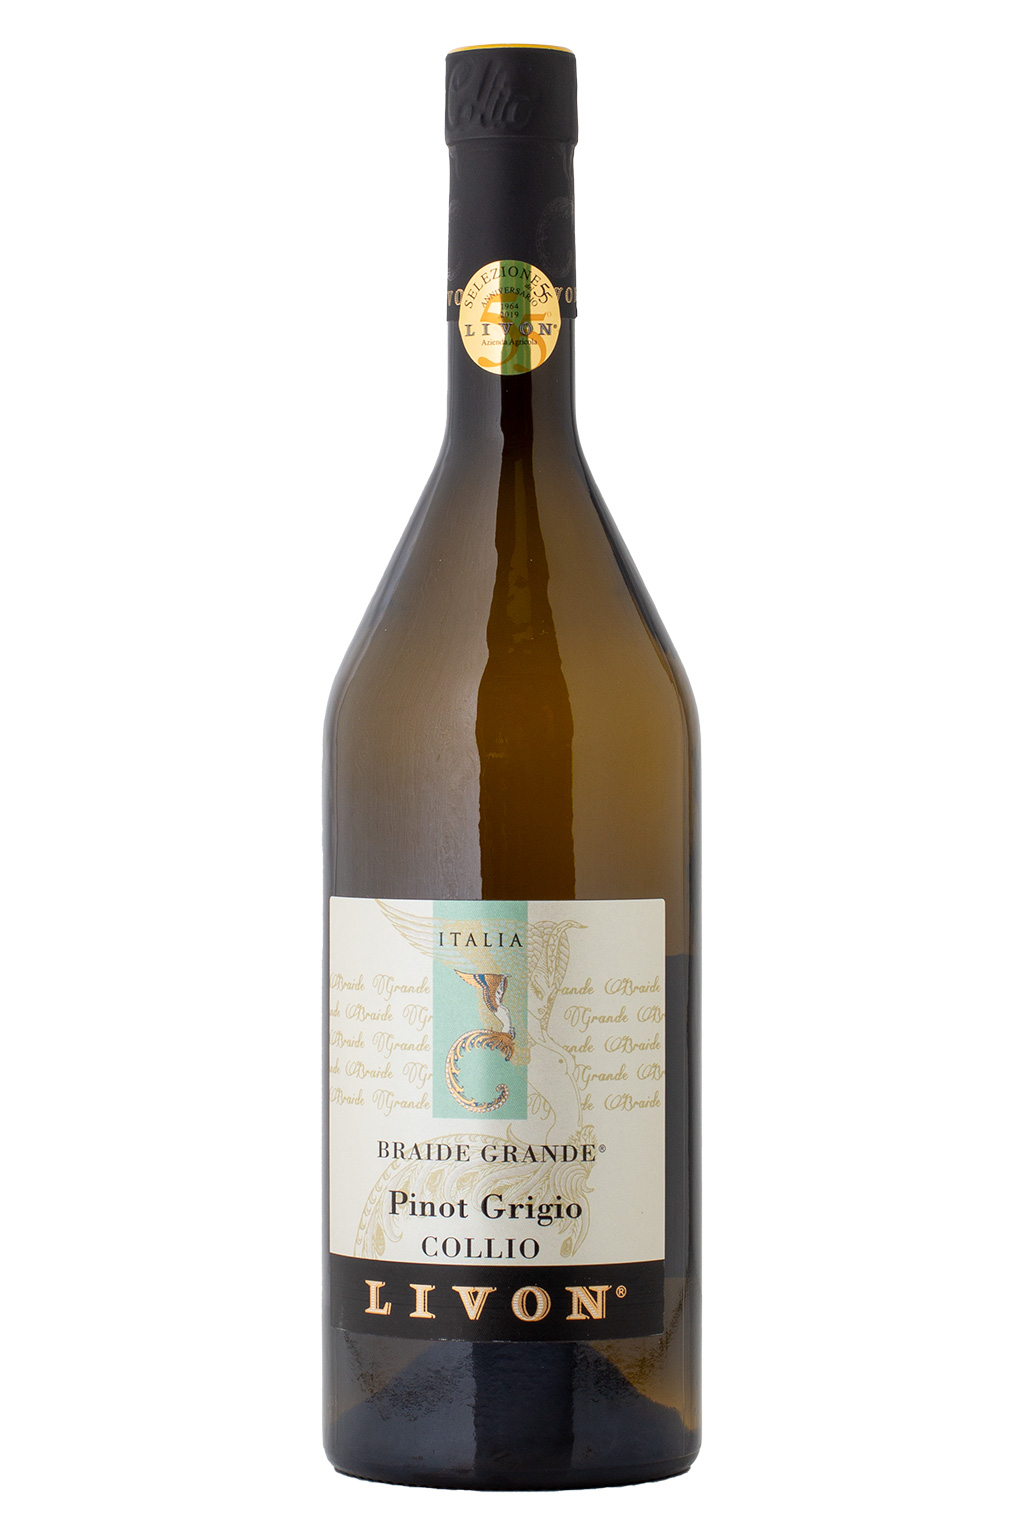 Livon Pinot Grigio GRAN CRU braide grande web